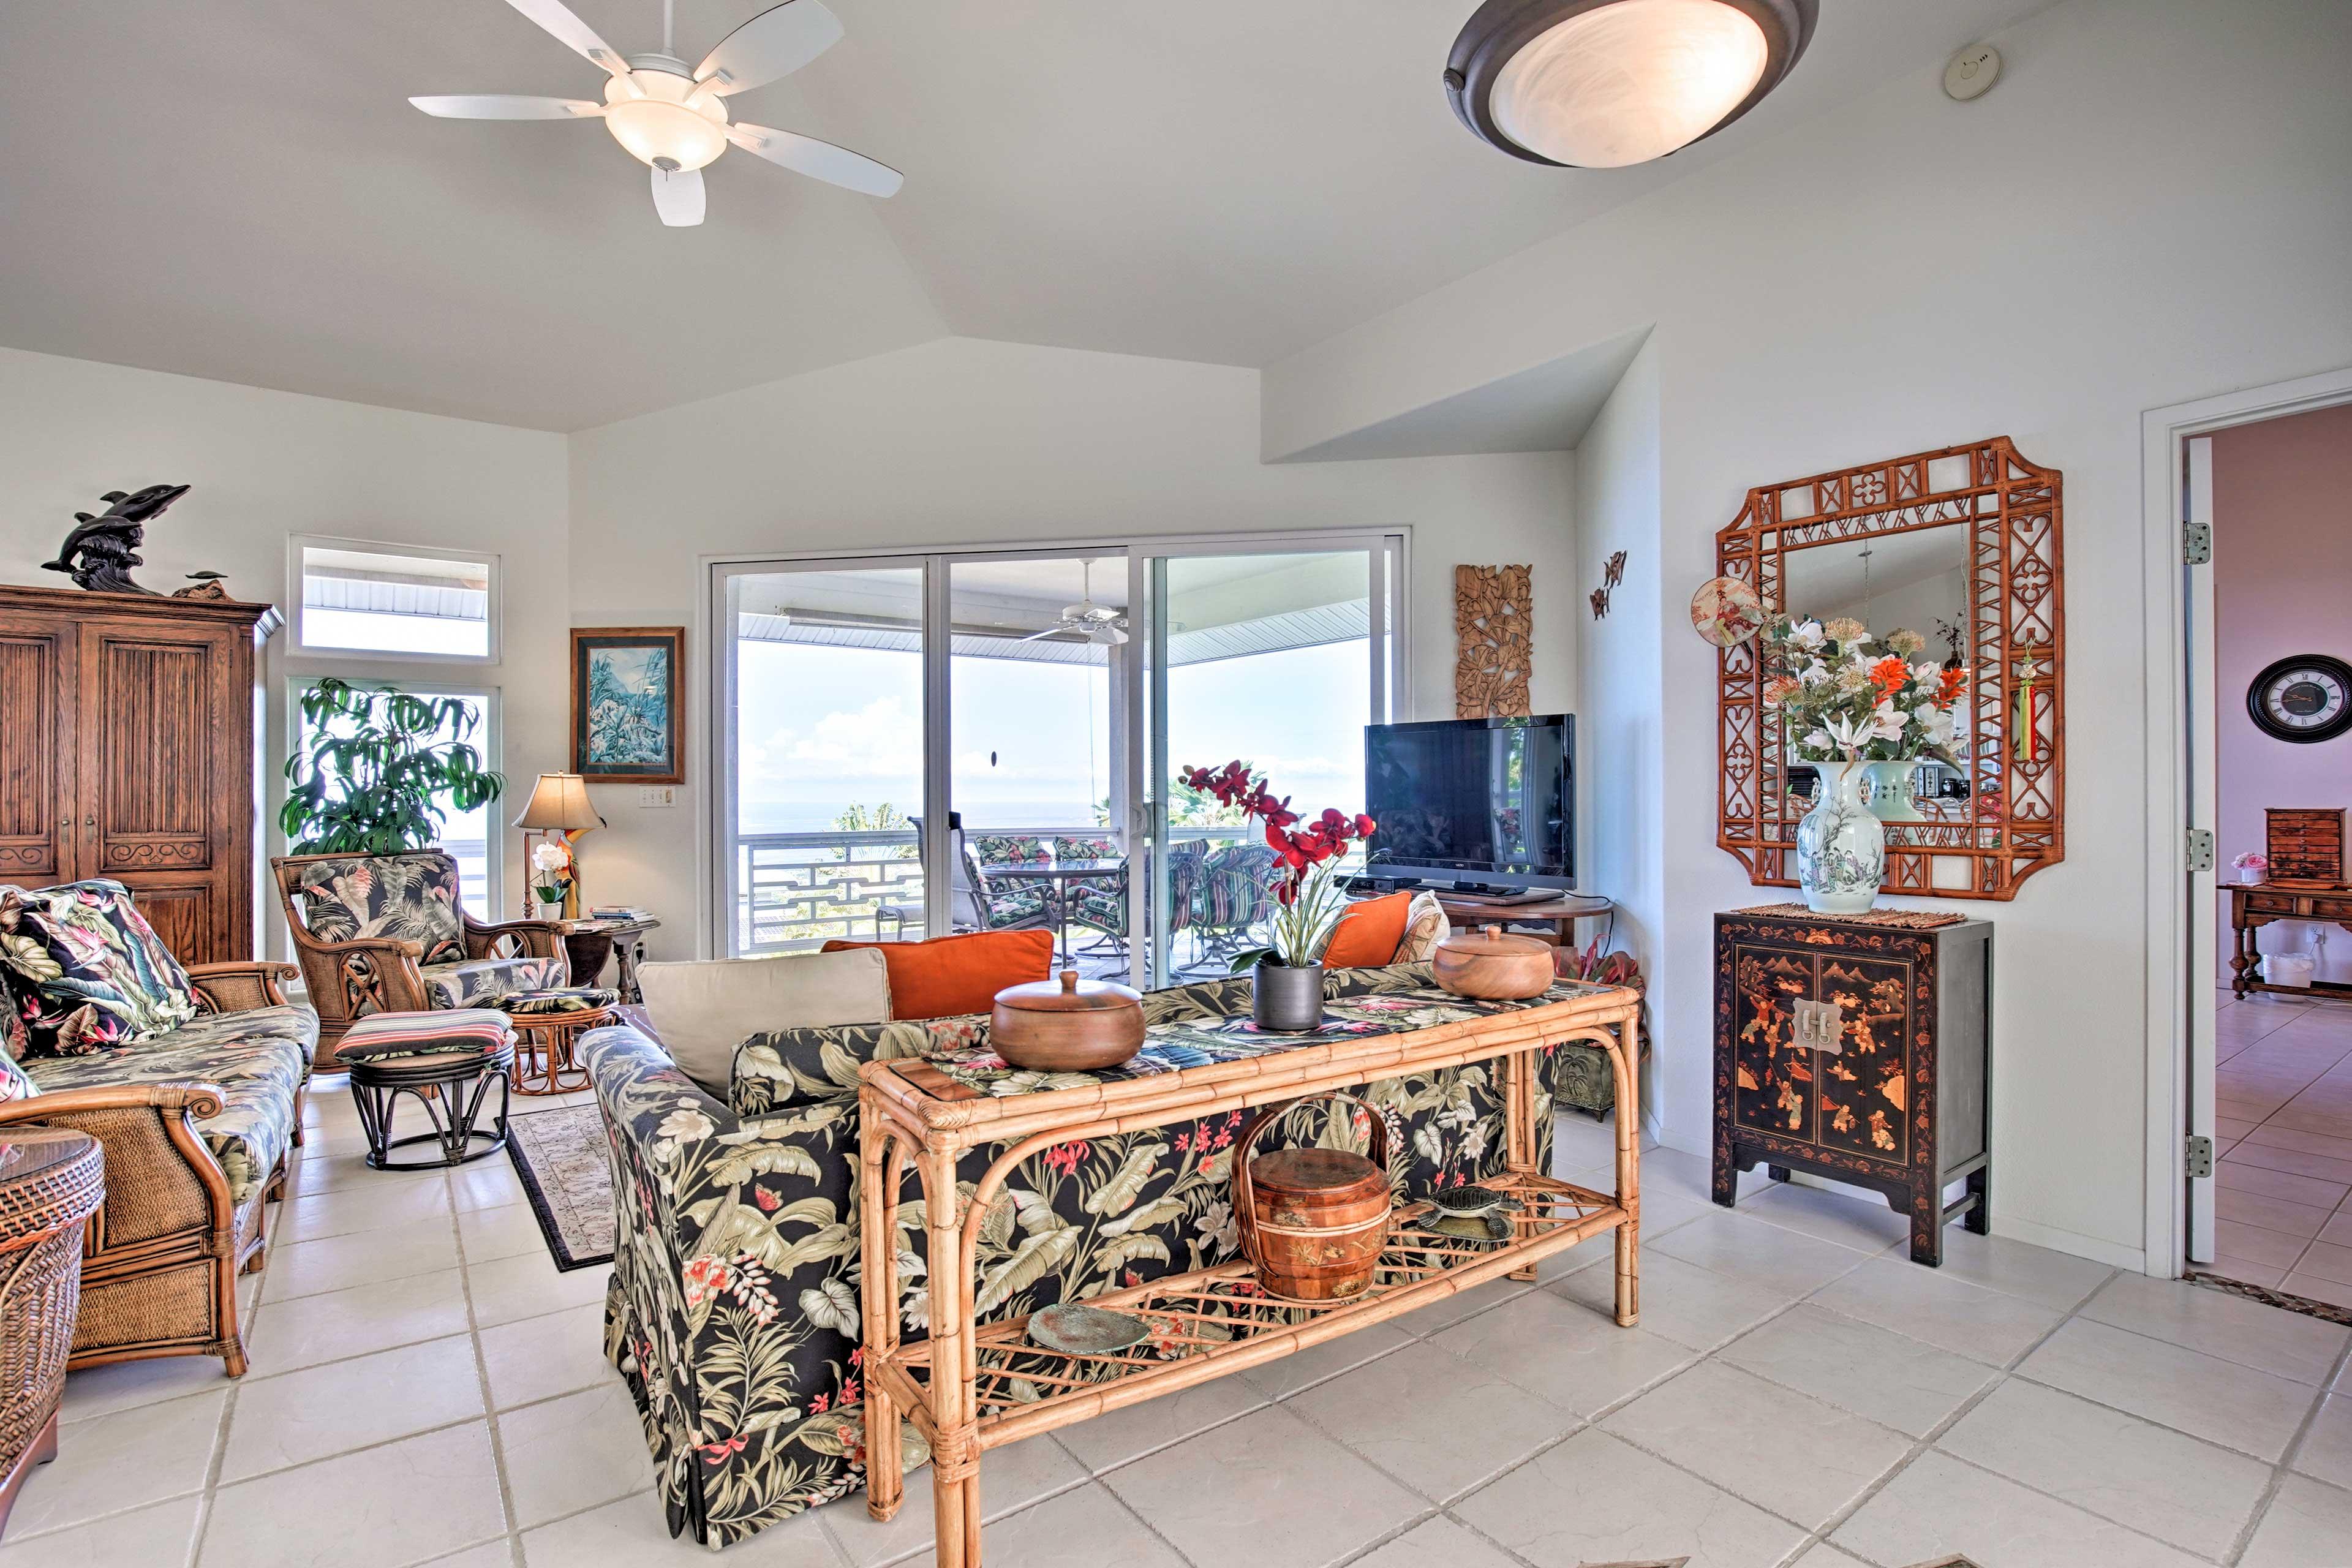 You'll love the festive Hawaiian decor throughout the home.